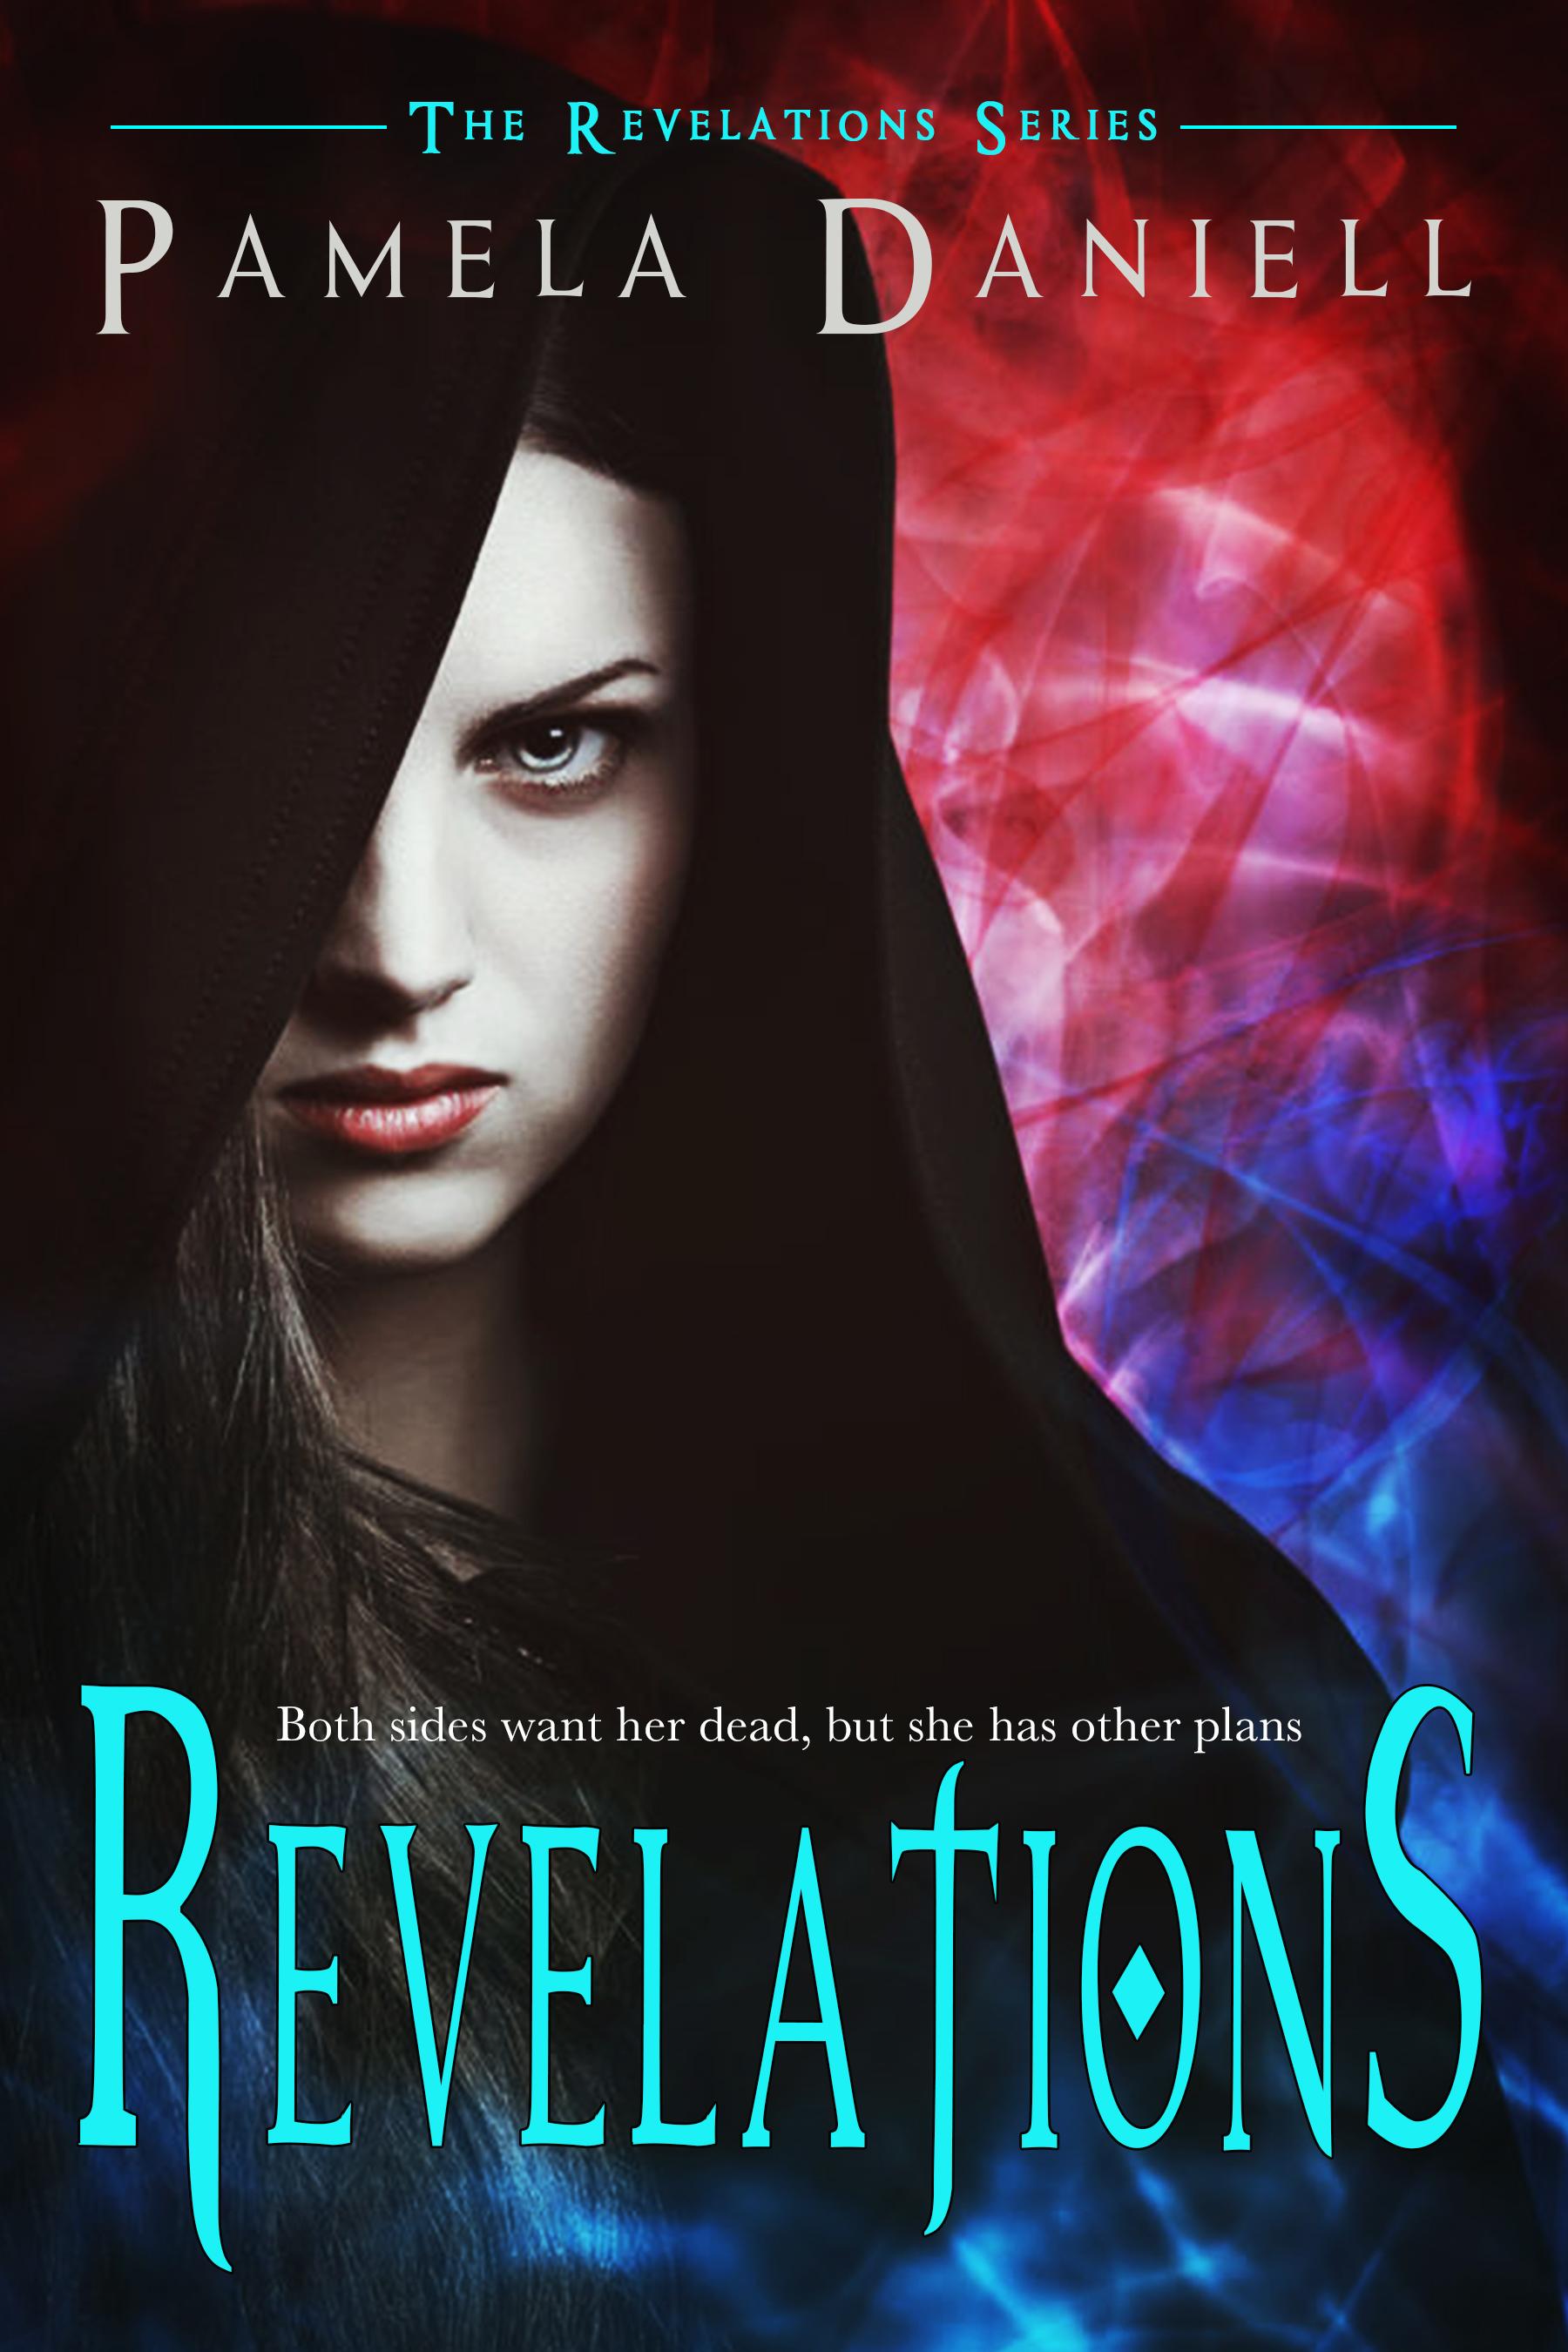 1 Revelations copy.jpg